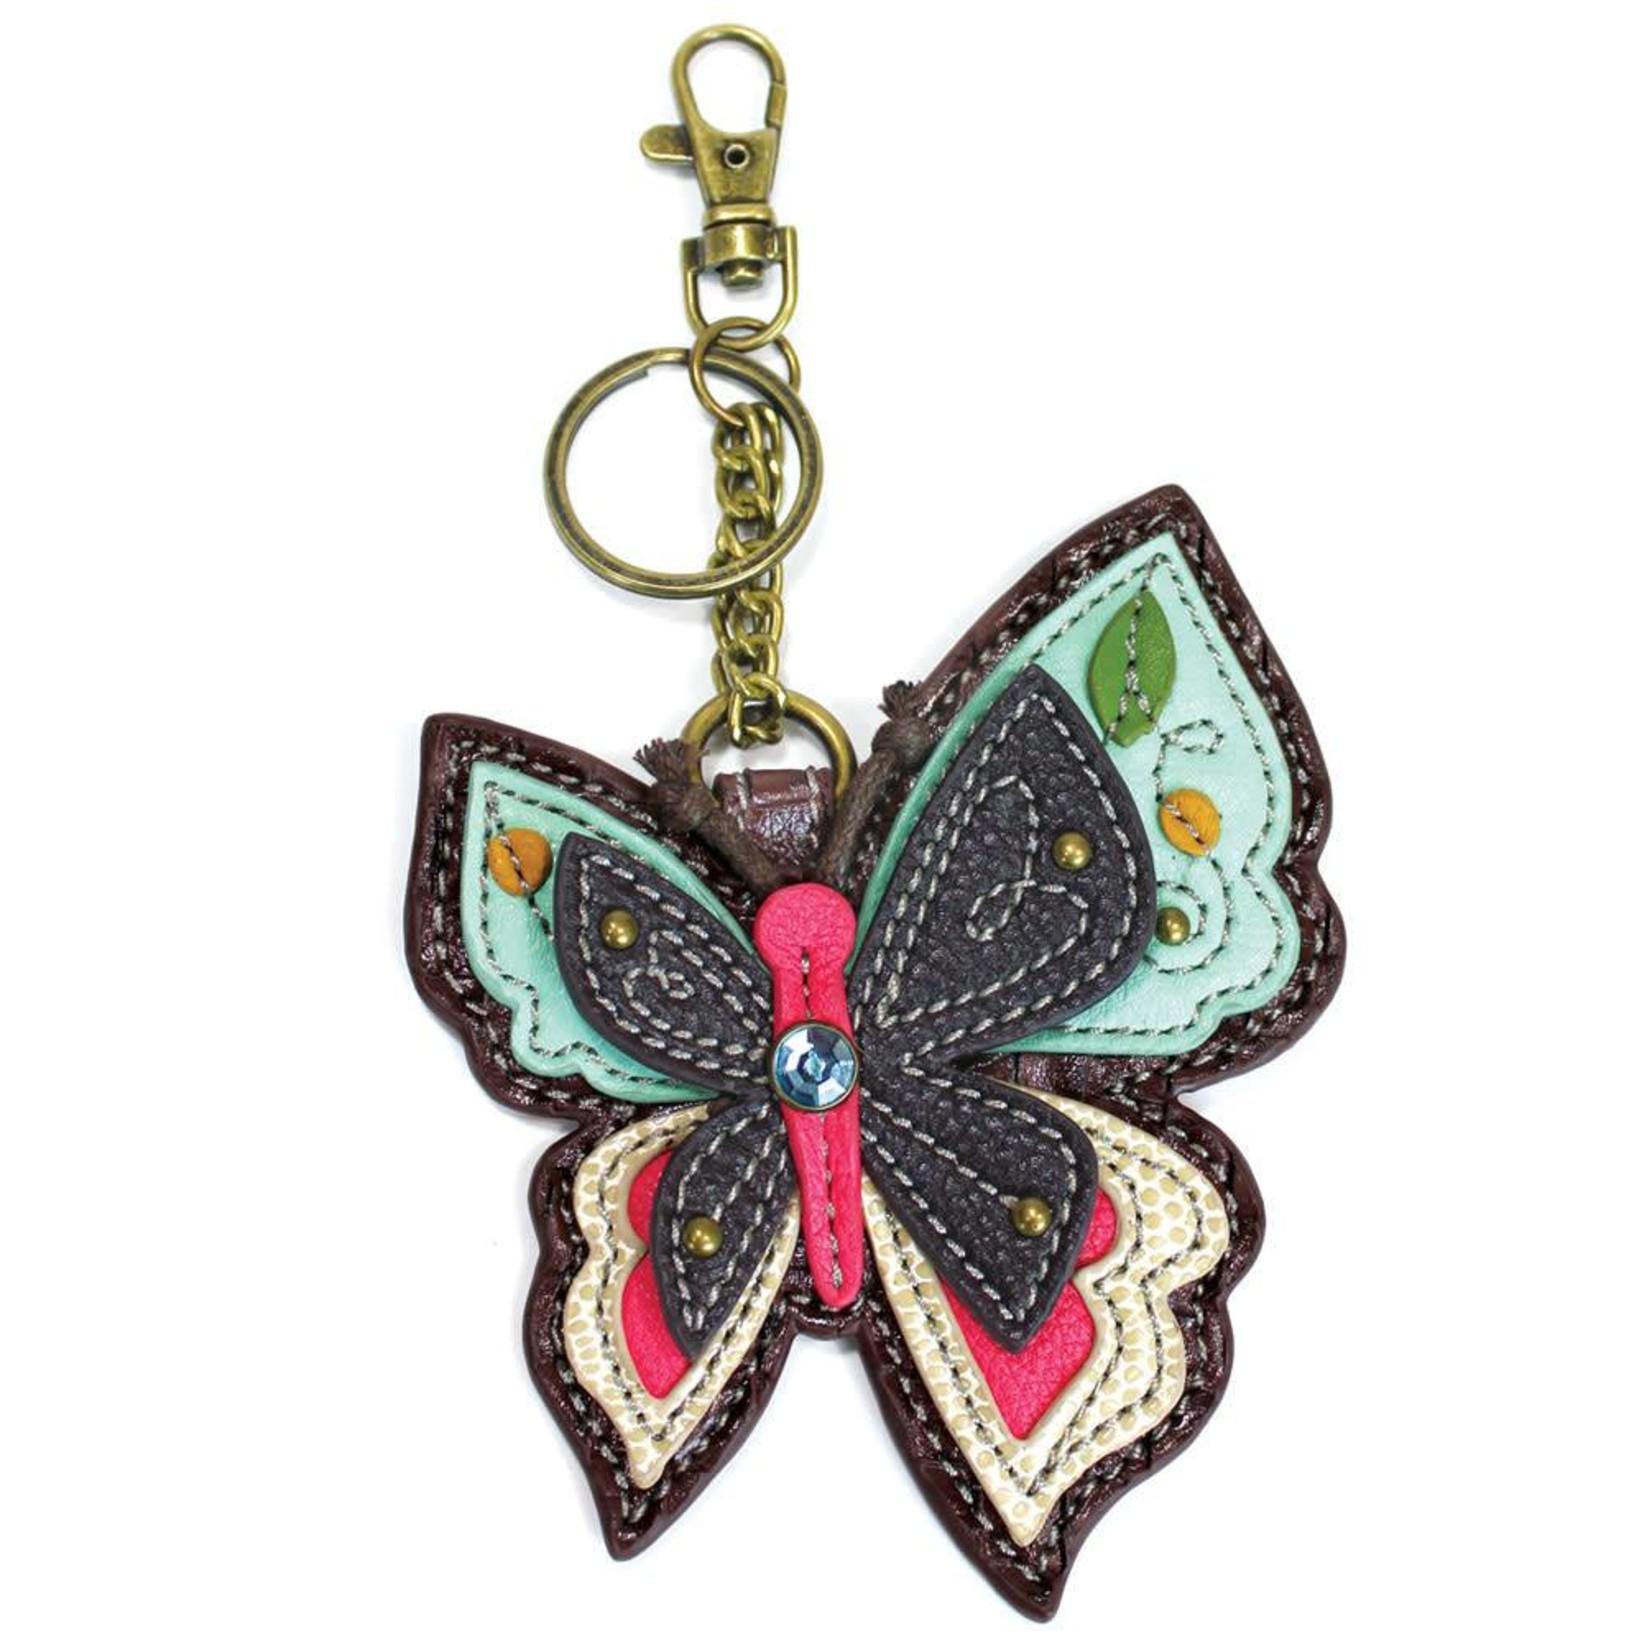 Chala Key Fob New Butterfly